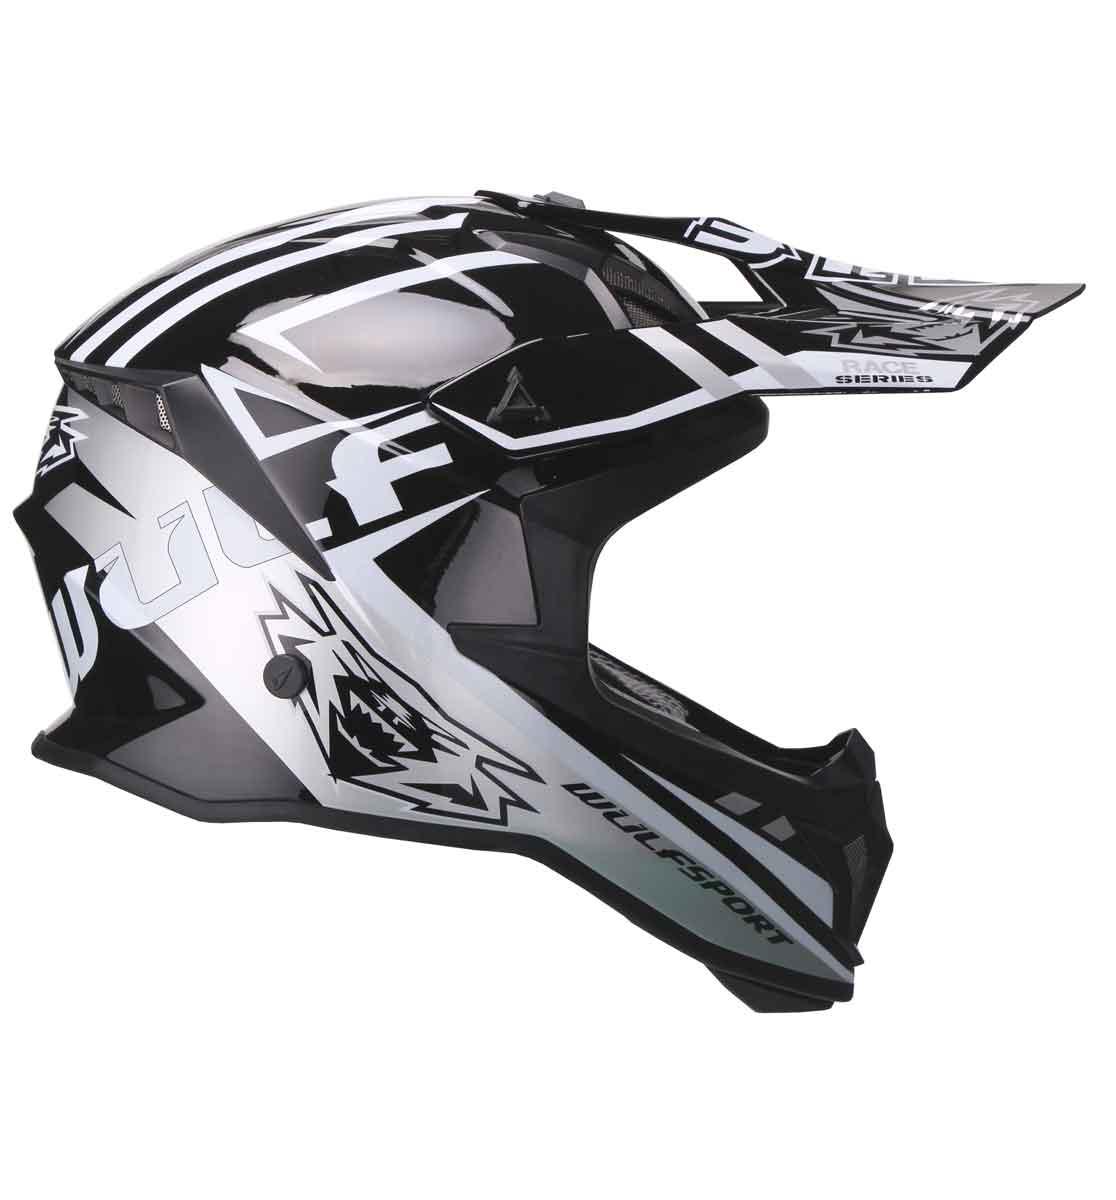 Wulfsport Race Series Helmet | Black | Medium (57-58cm)